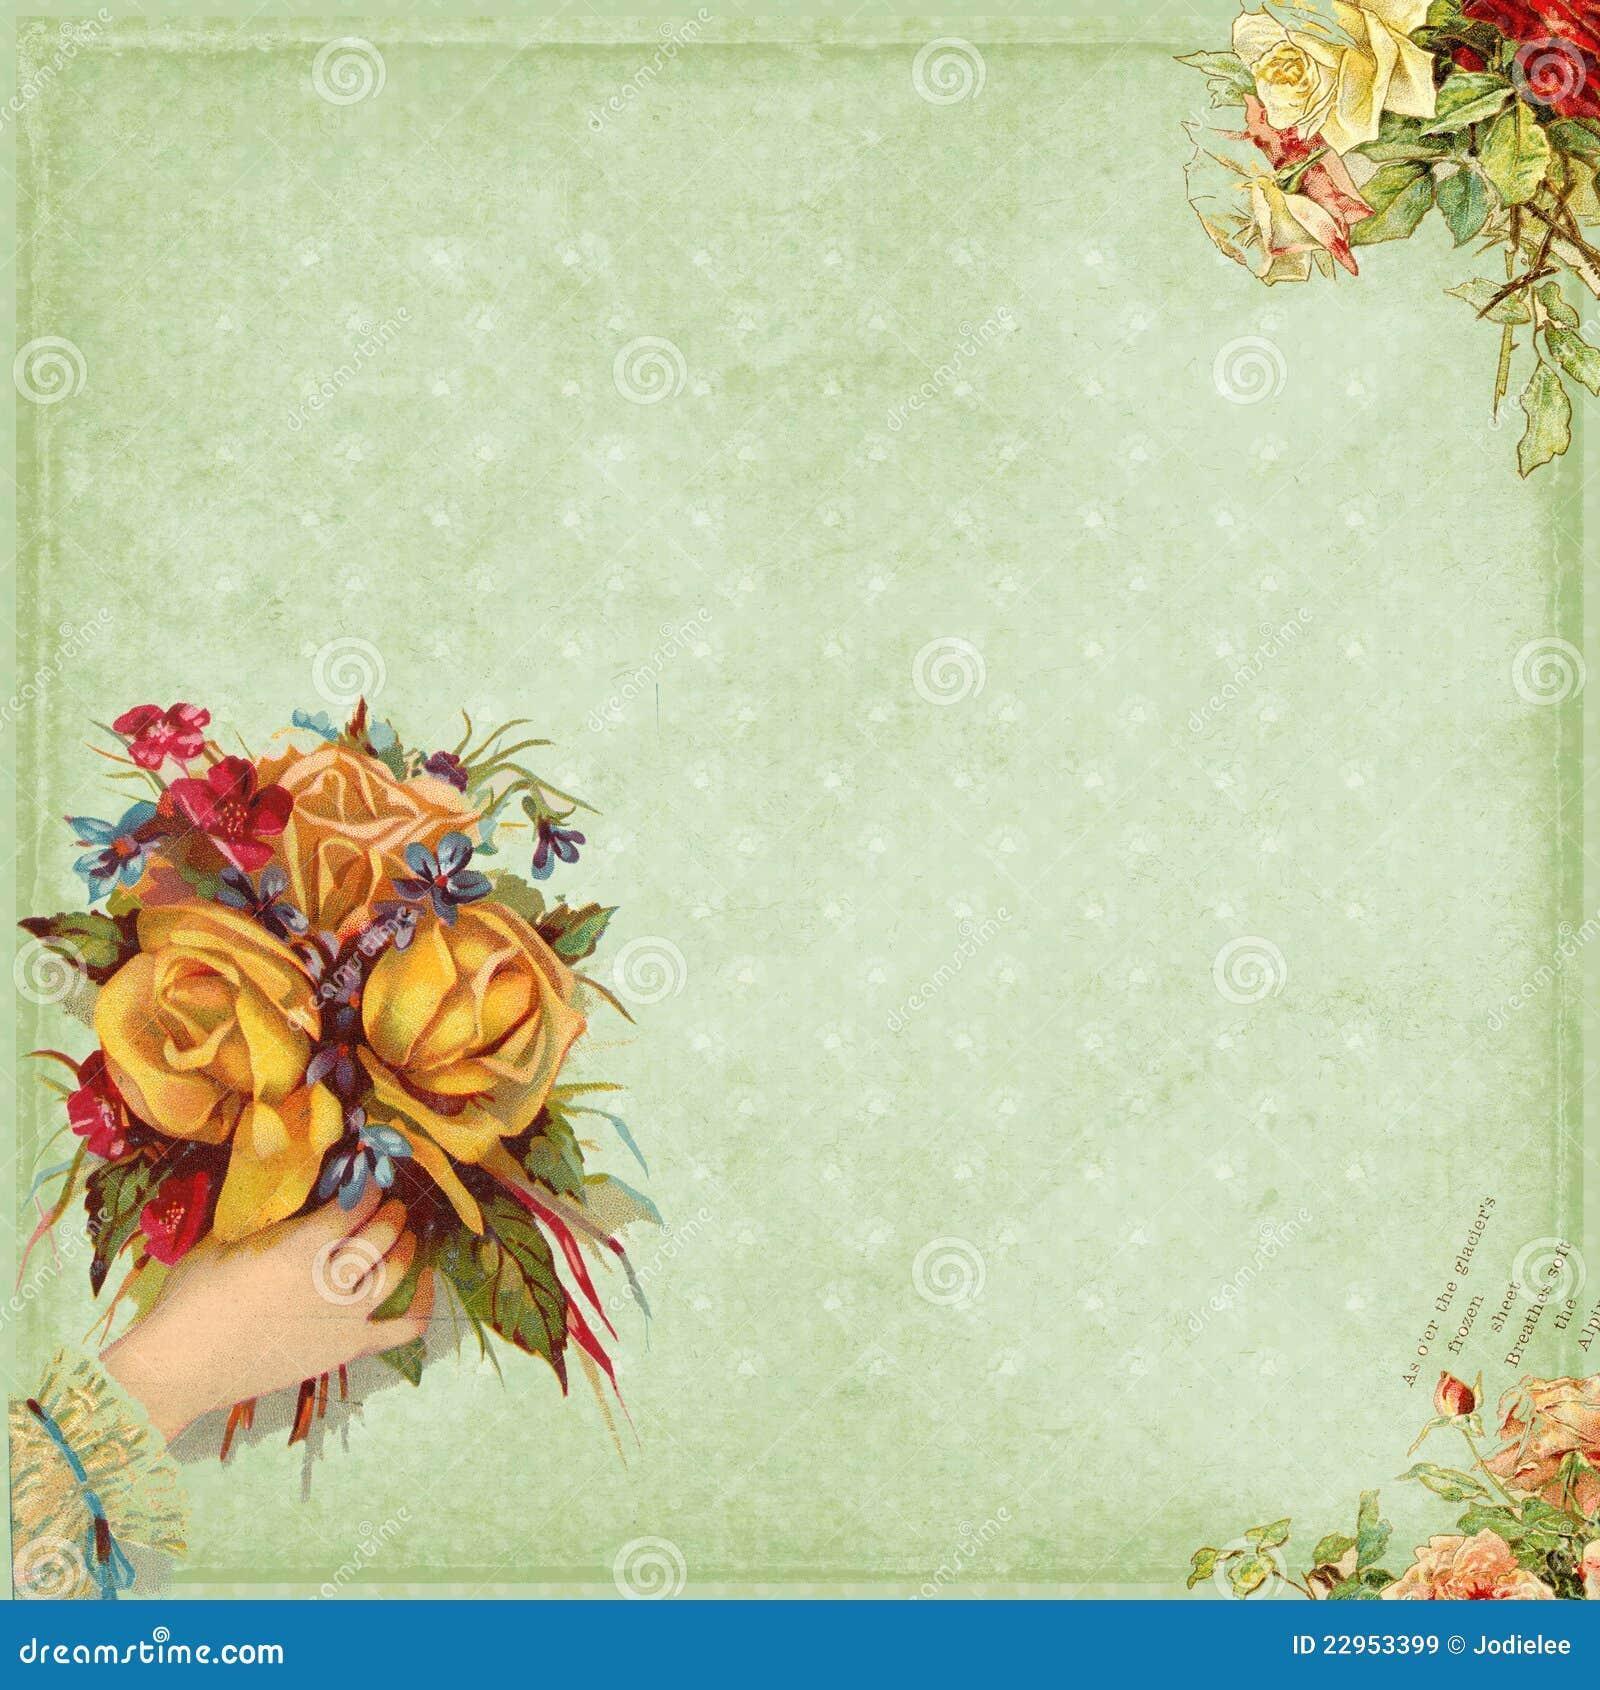 викторианец типа удерживания руки рамки цветков сладостное